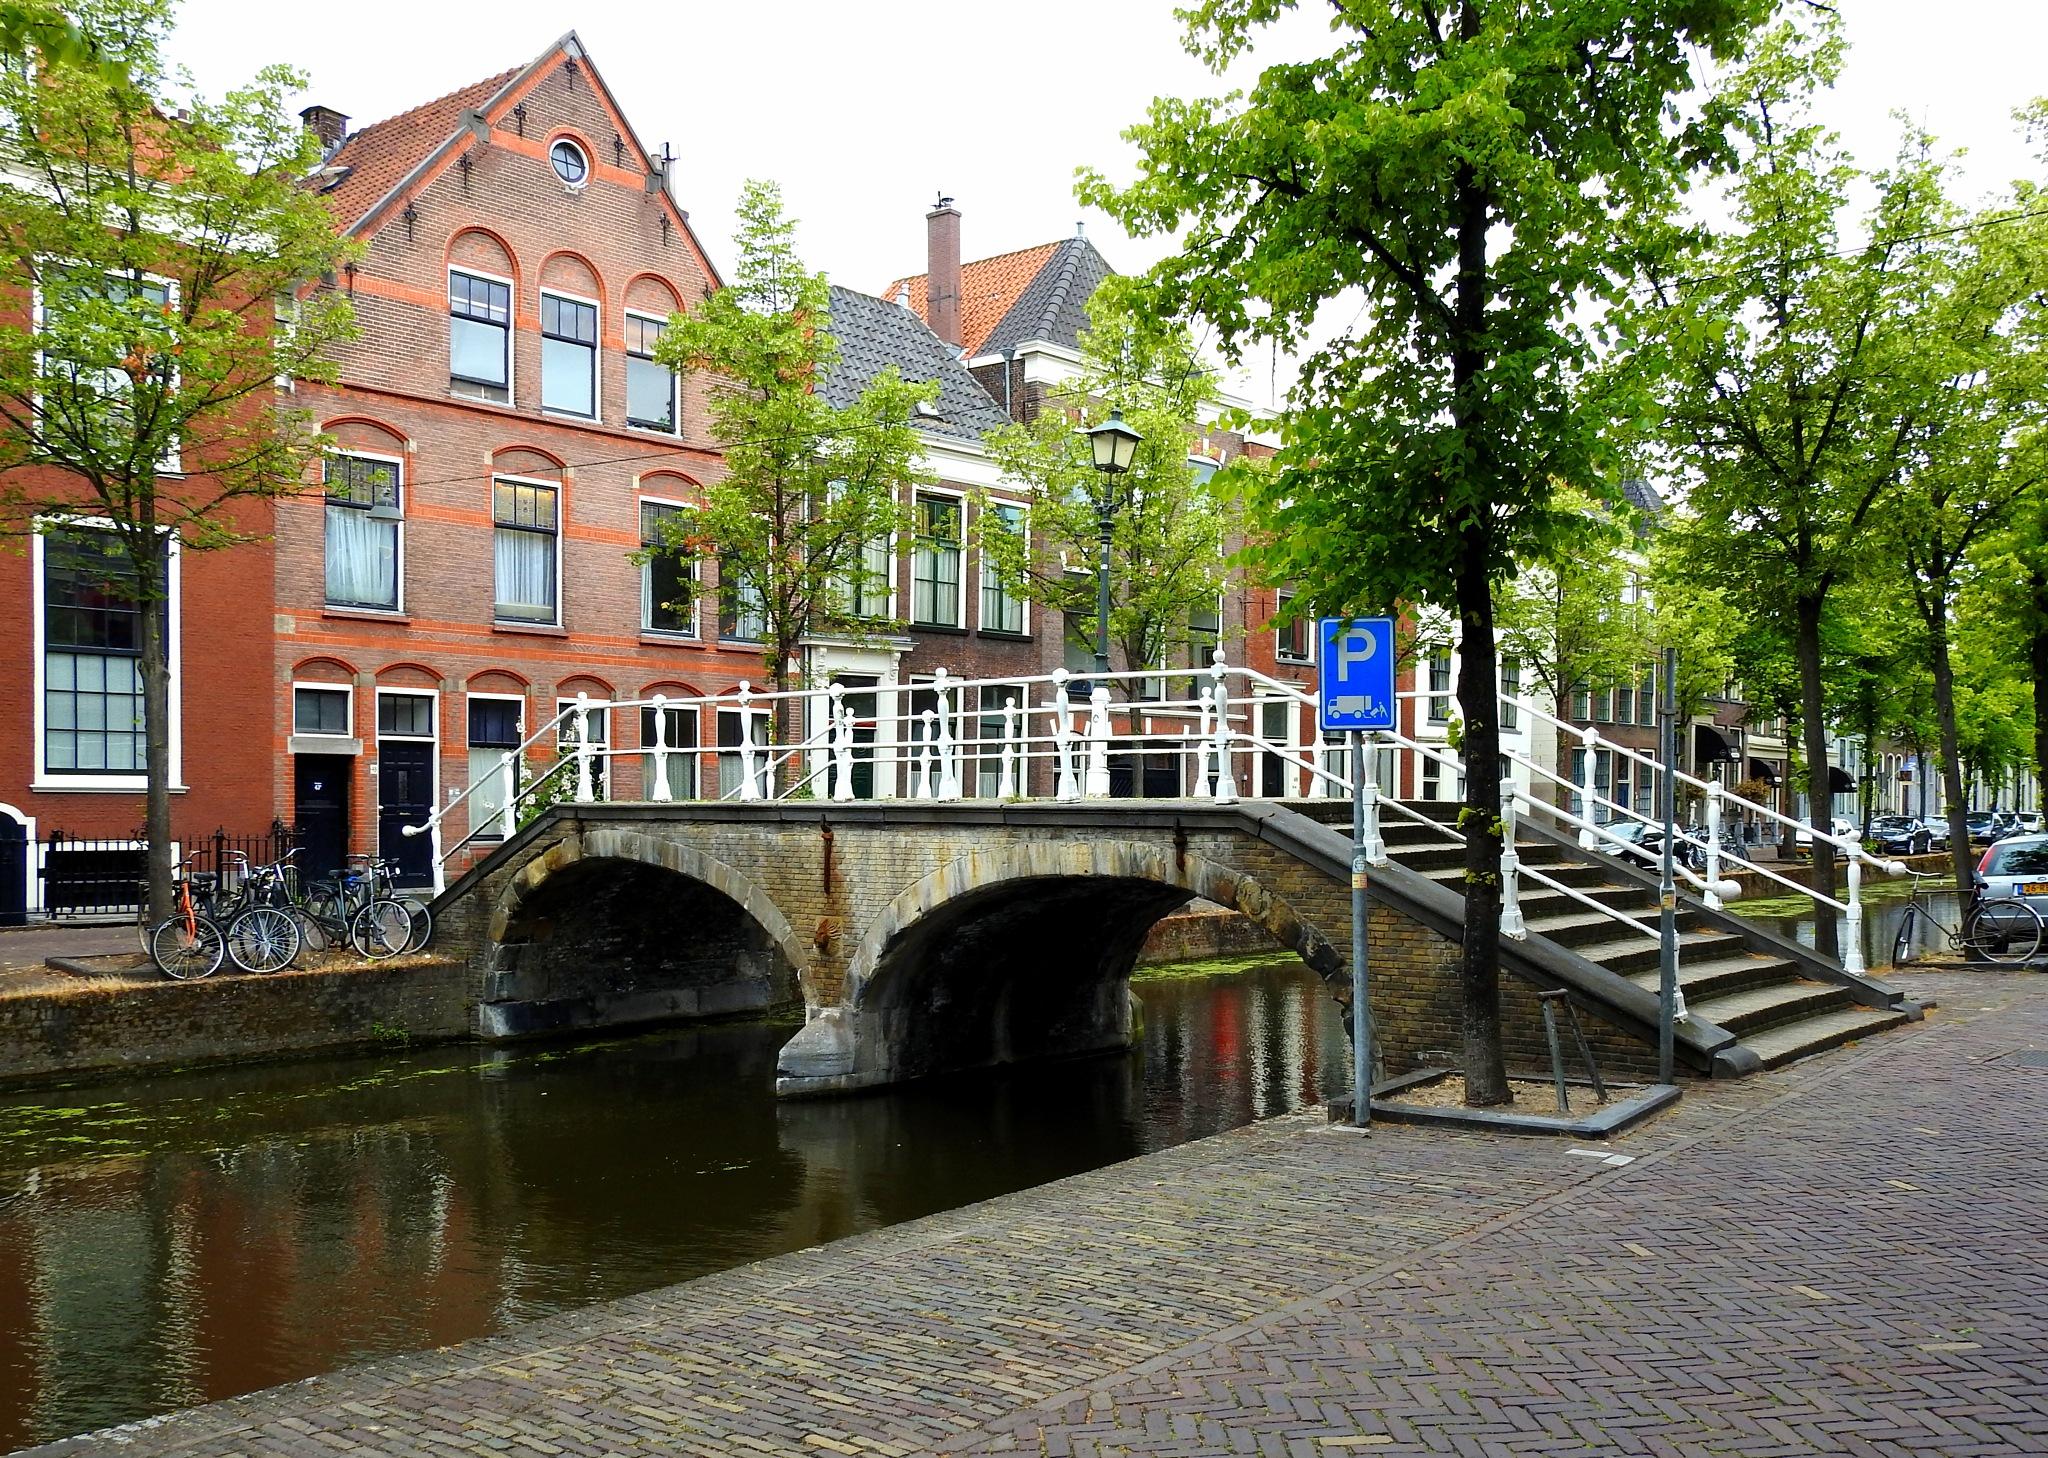 Delft (4) - Holland by Bob66